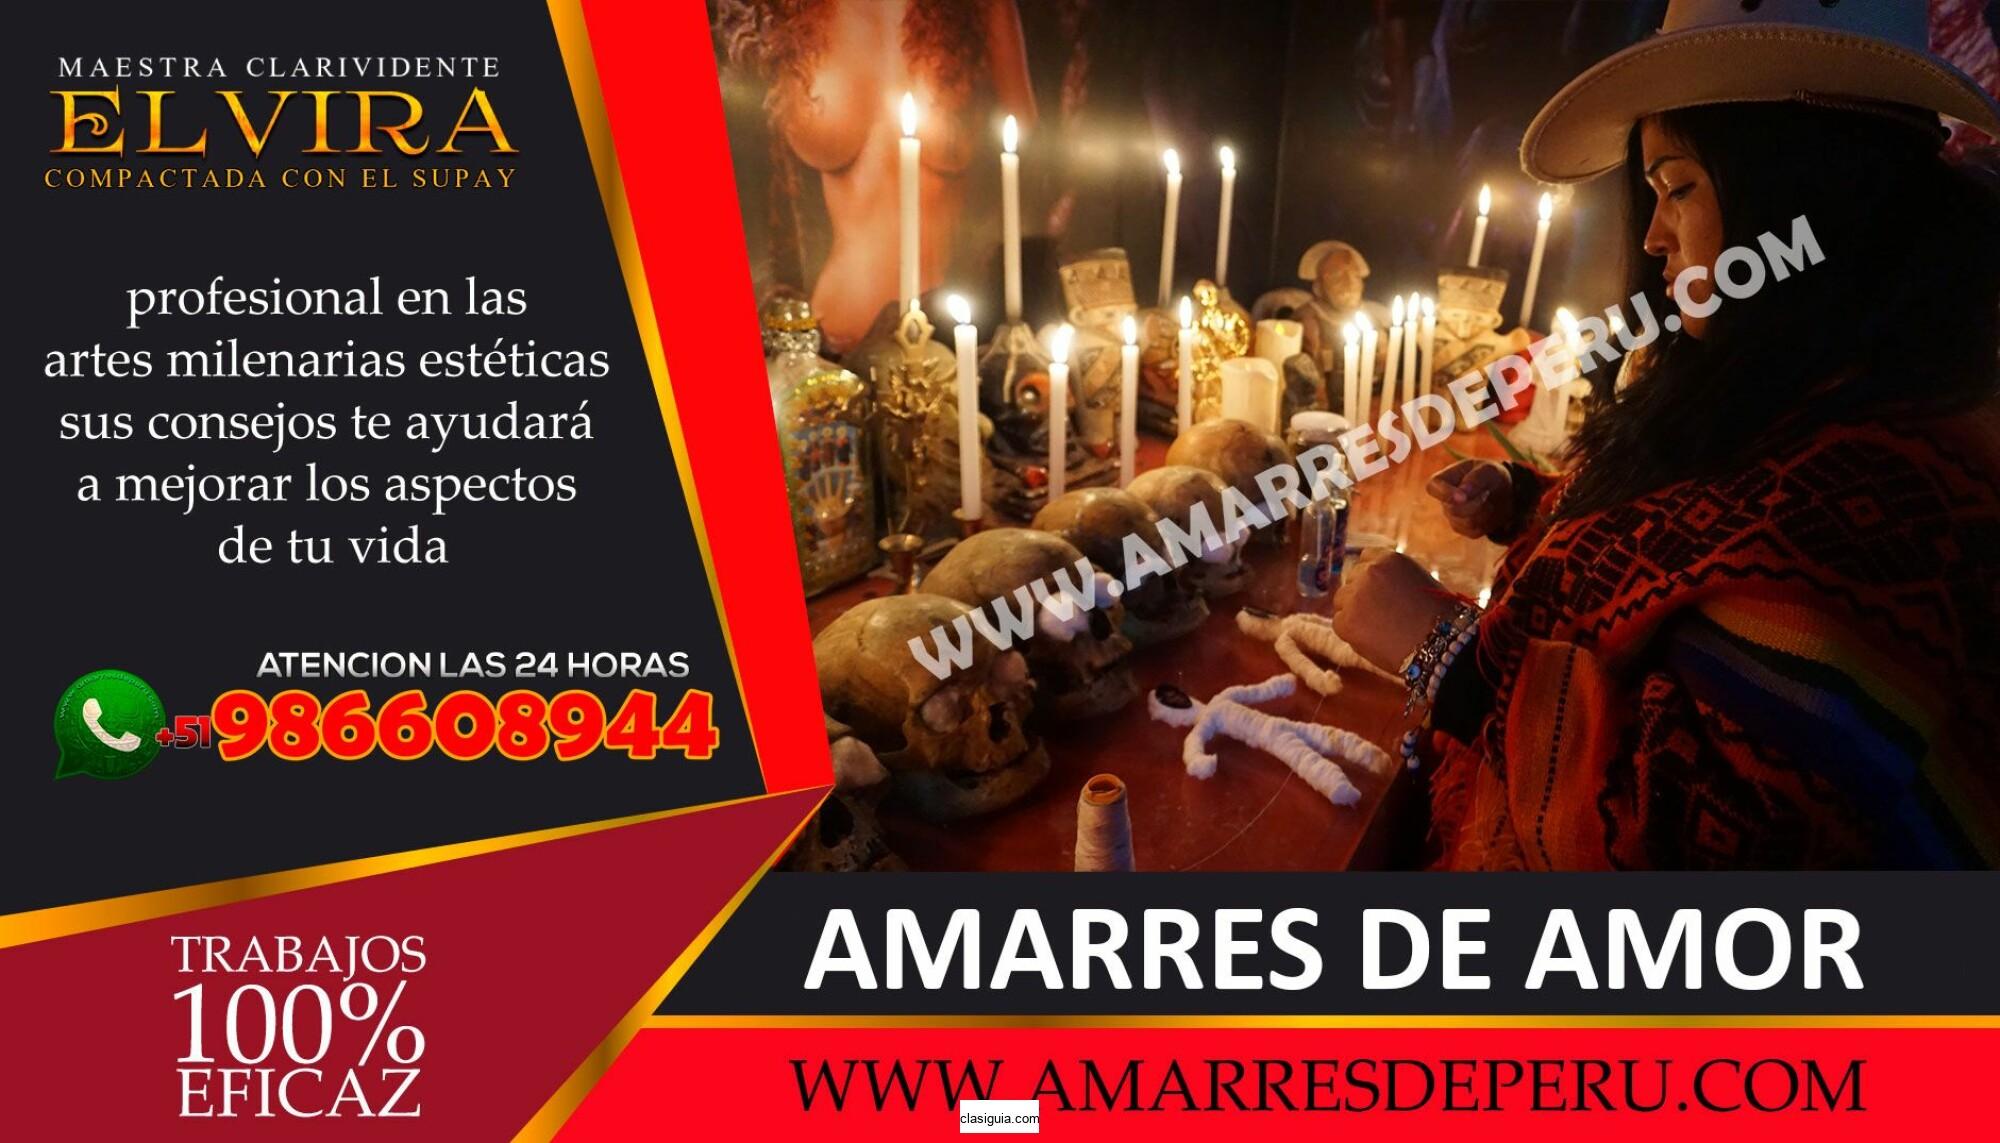 HECHICERA ELVIRA _PODEROSO AMARRES DE AMOR